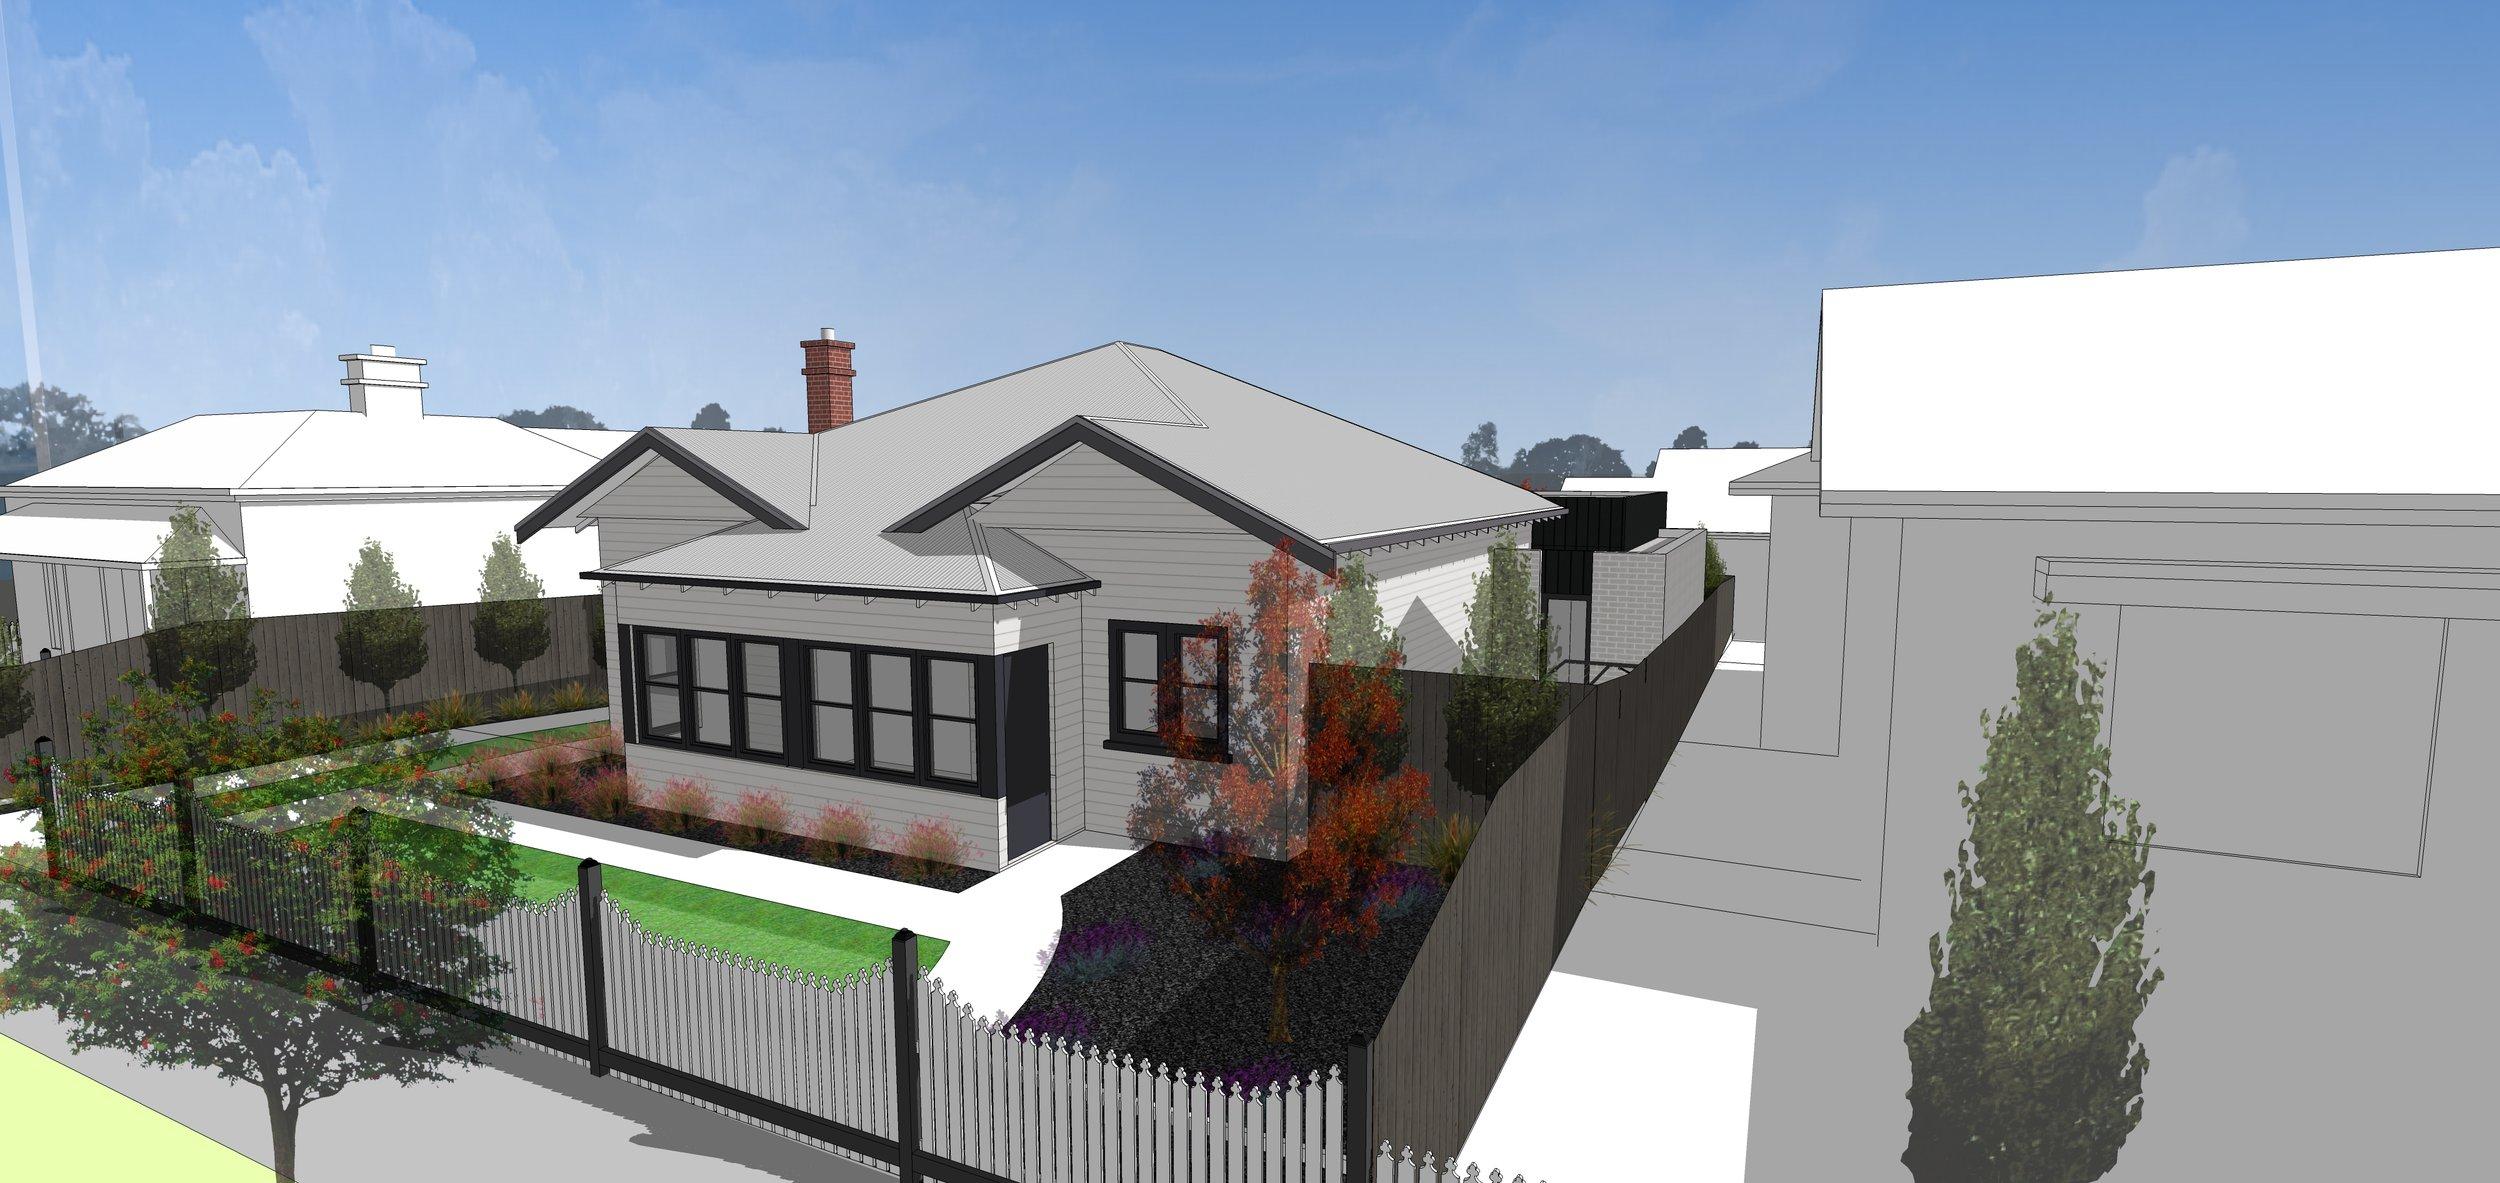 View 07 - (Rev 02) 16 Gertrude Street, Geelong West.jpg